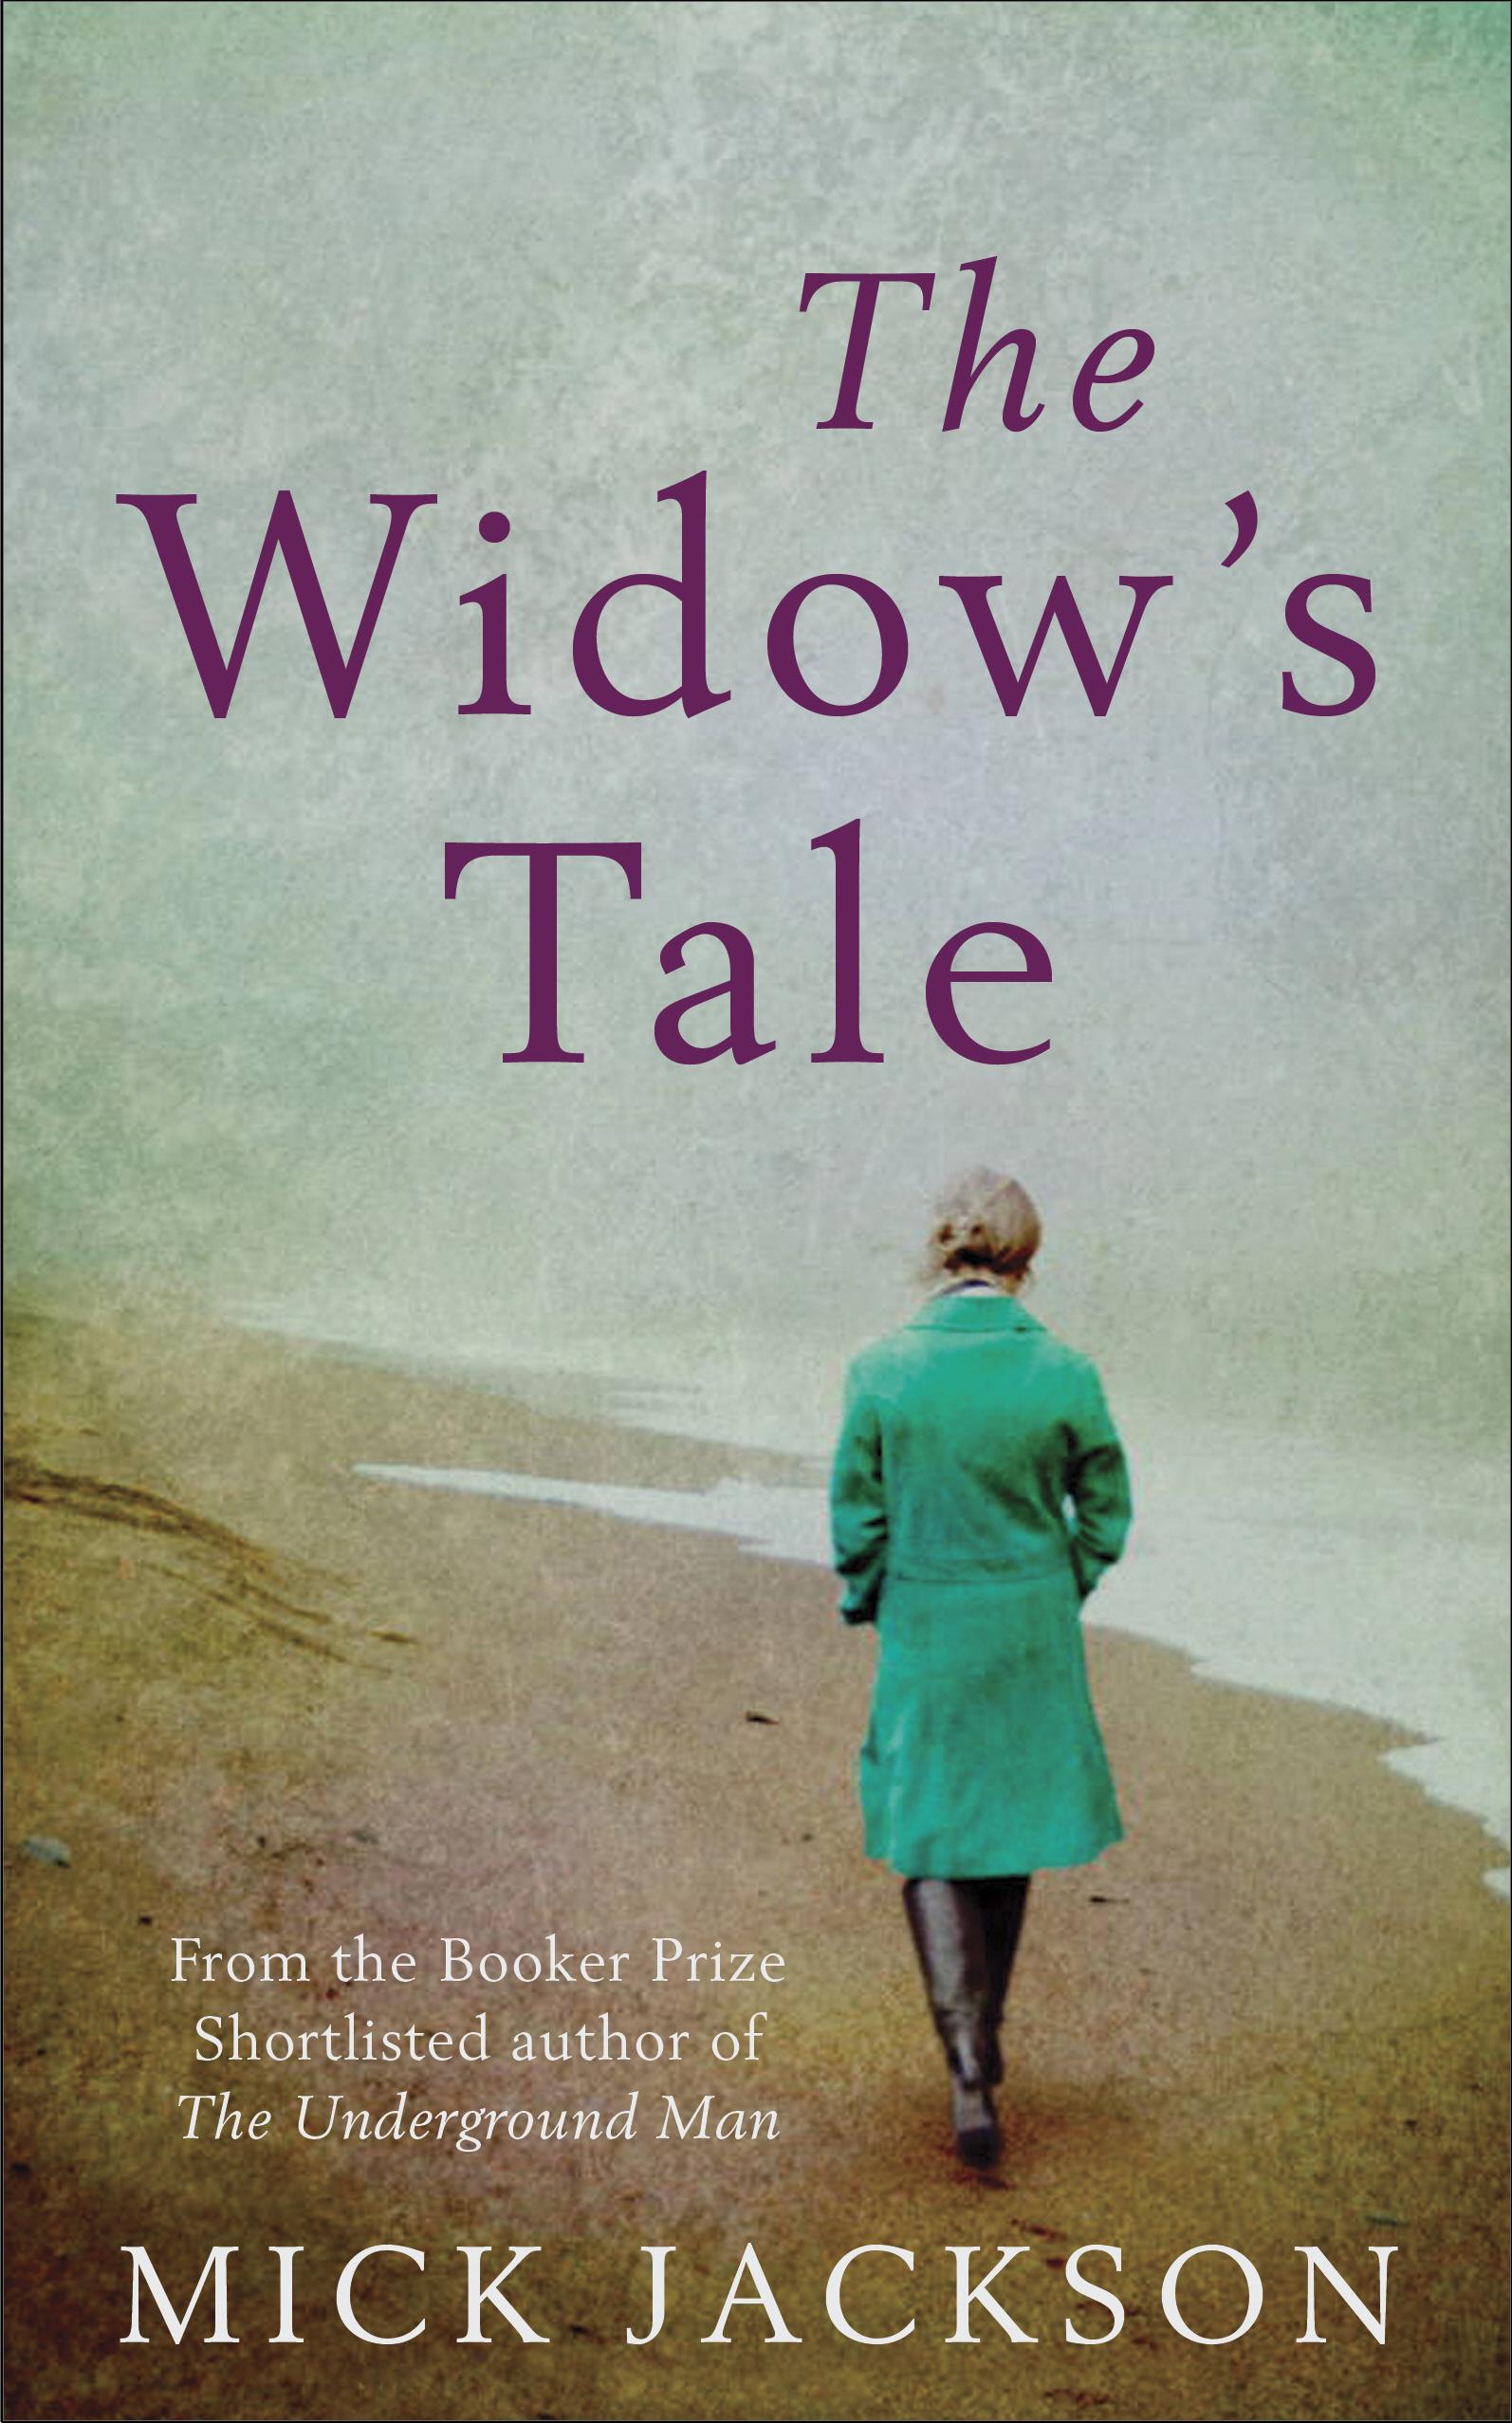 widow remarriage essay